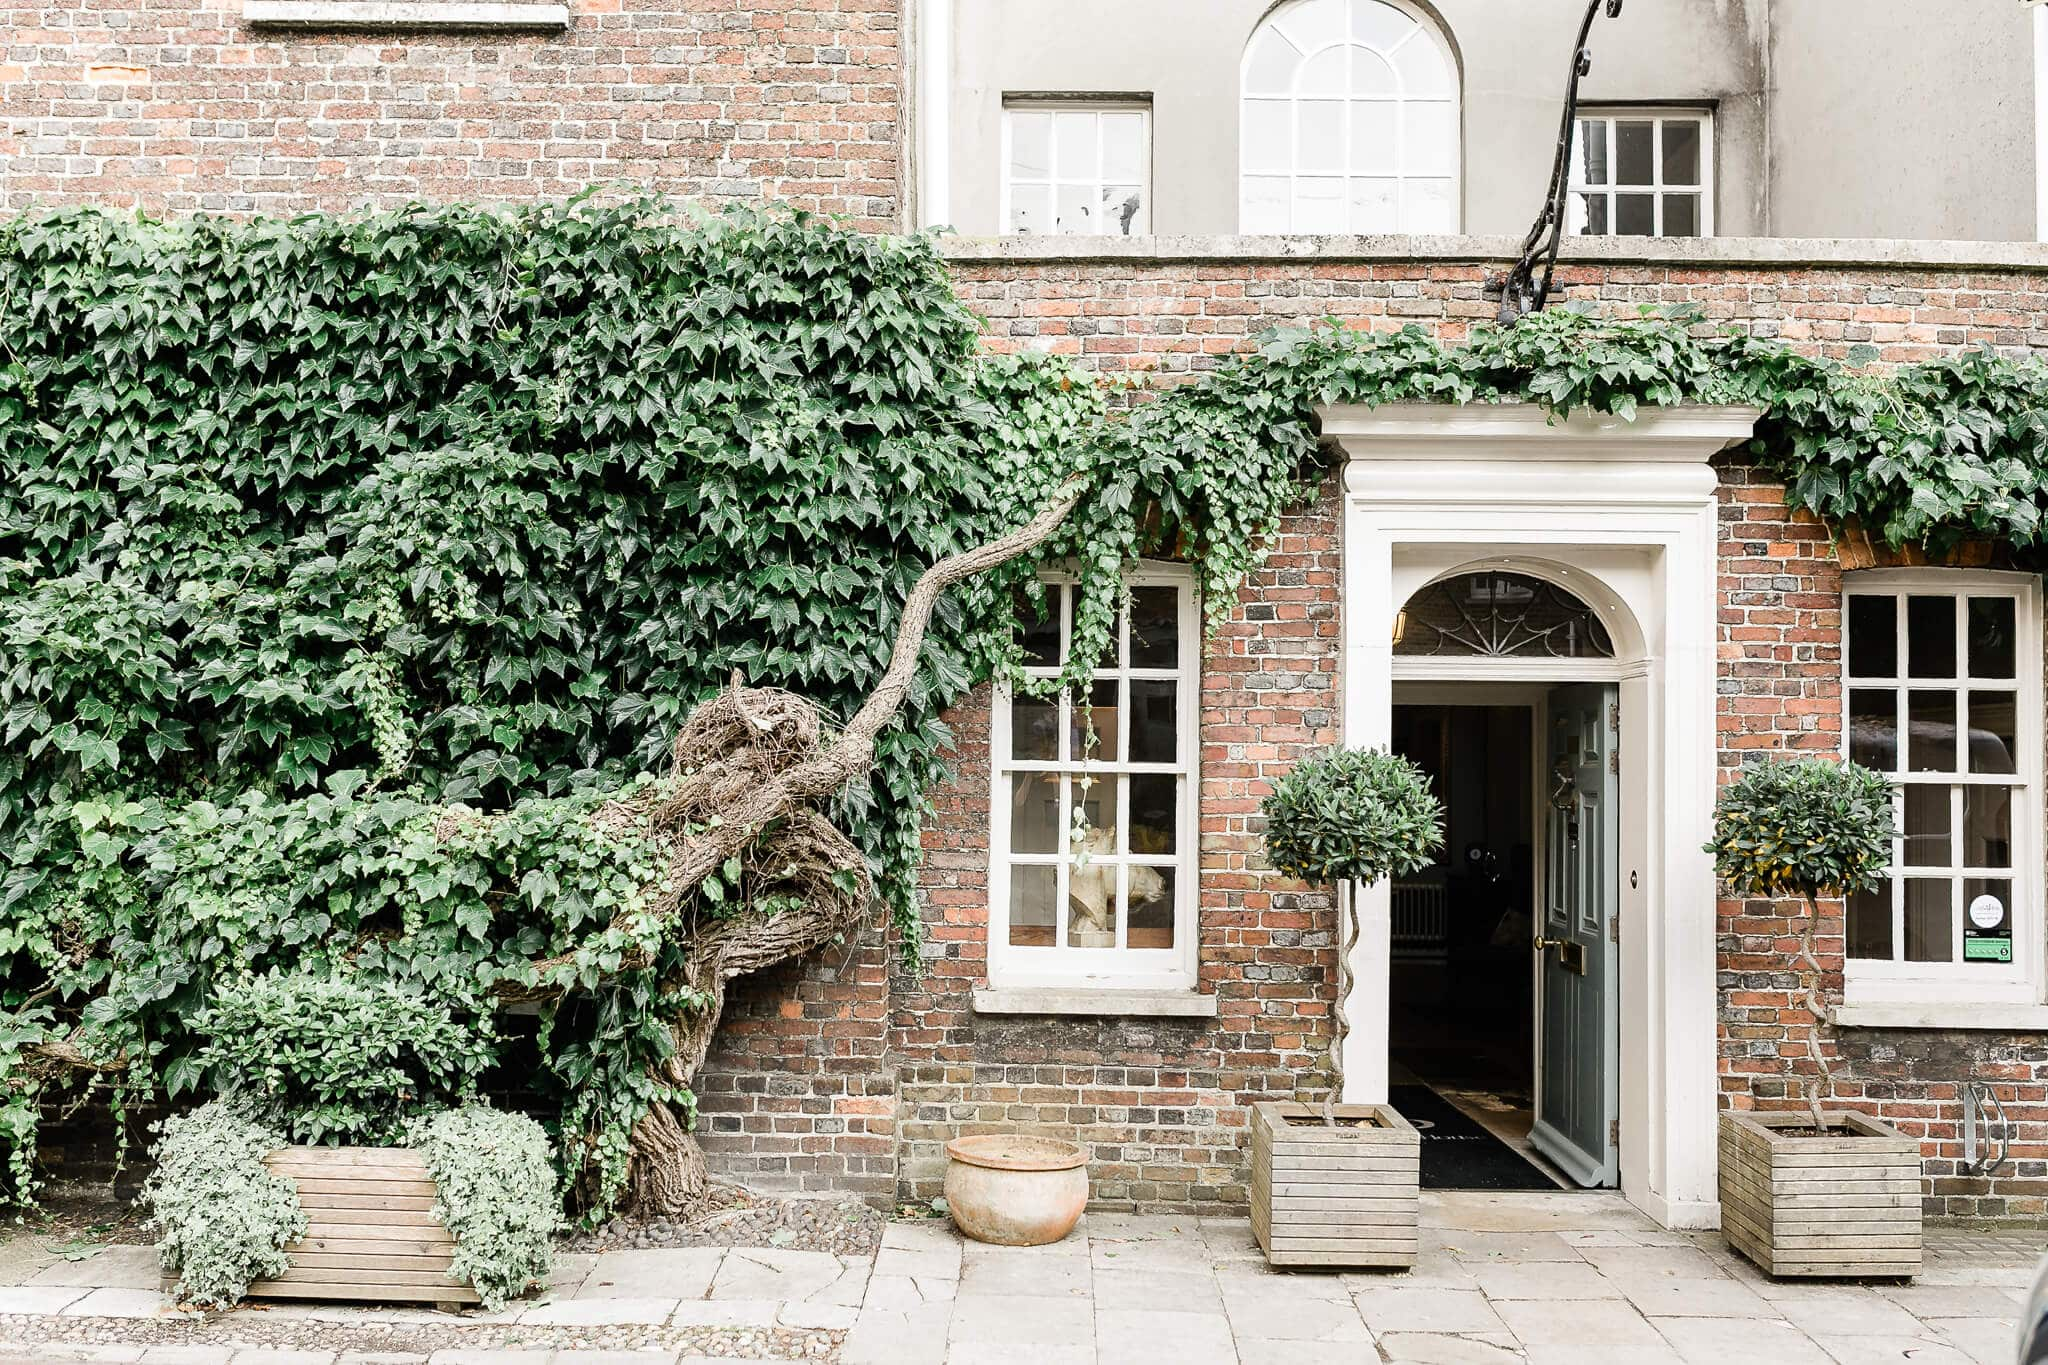 Pelham House in Lewes wedding venue